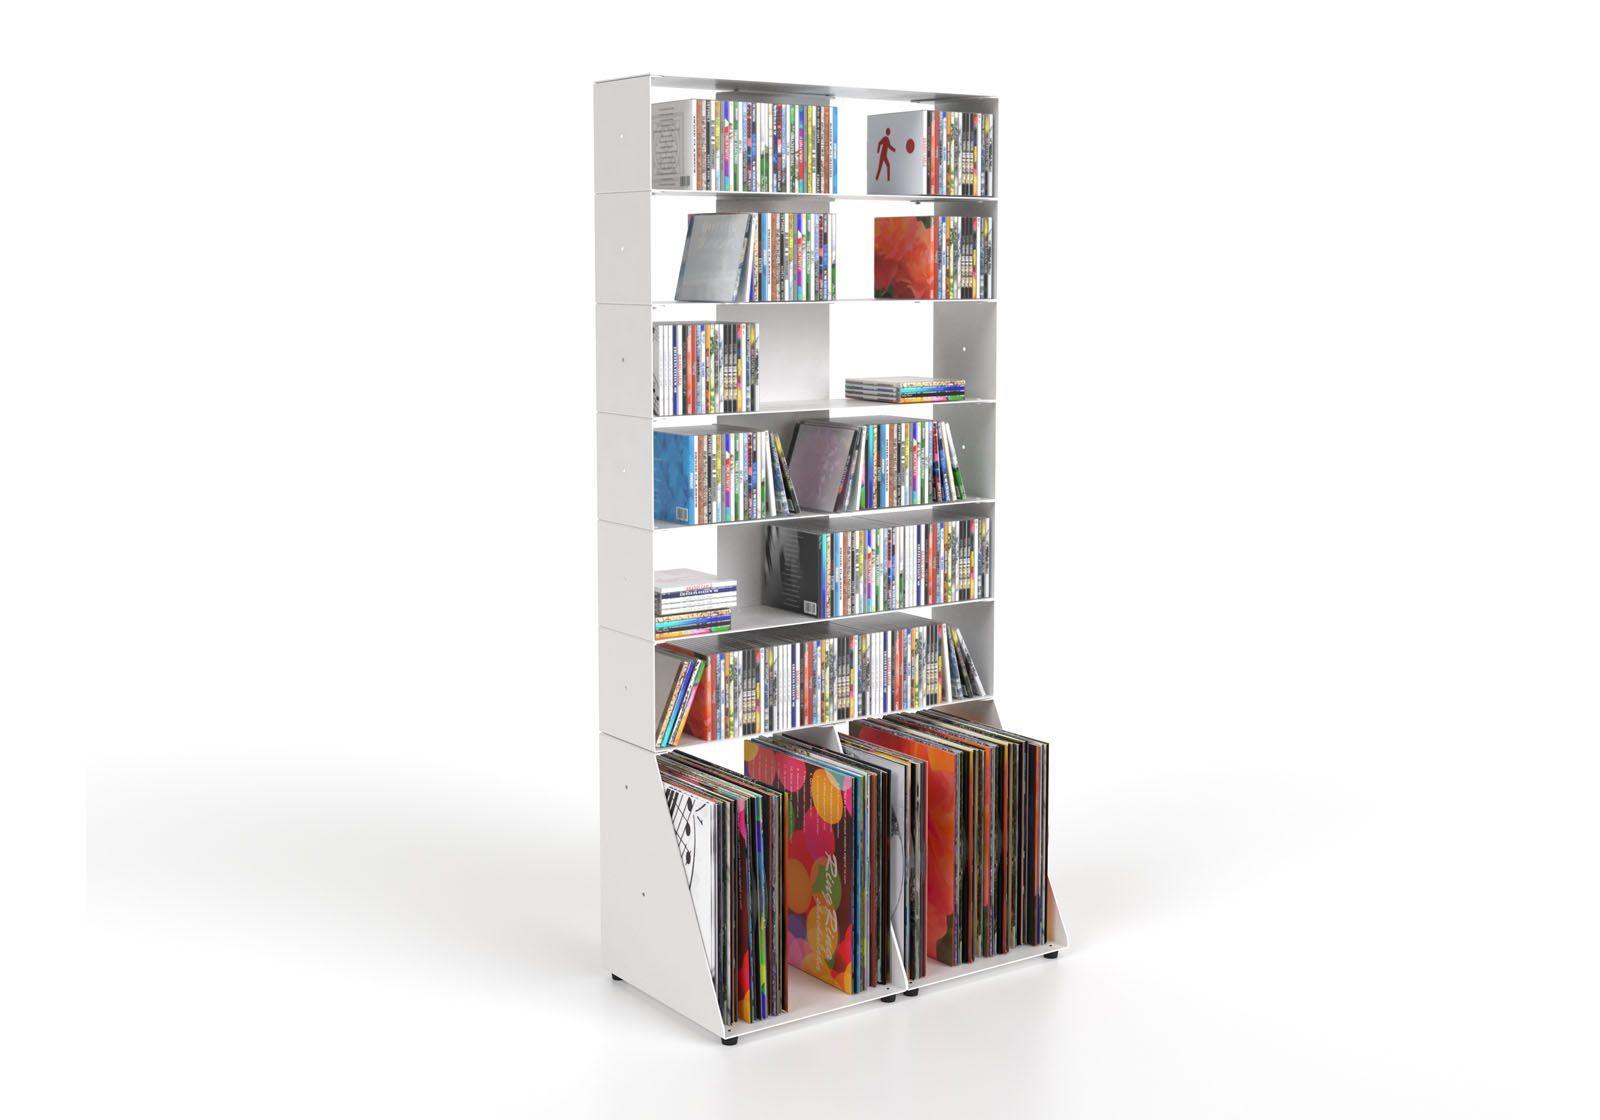 CD & vinyl storage W60 H125 D32 cm - 7 shelves